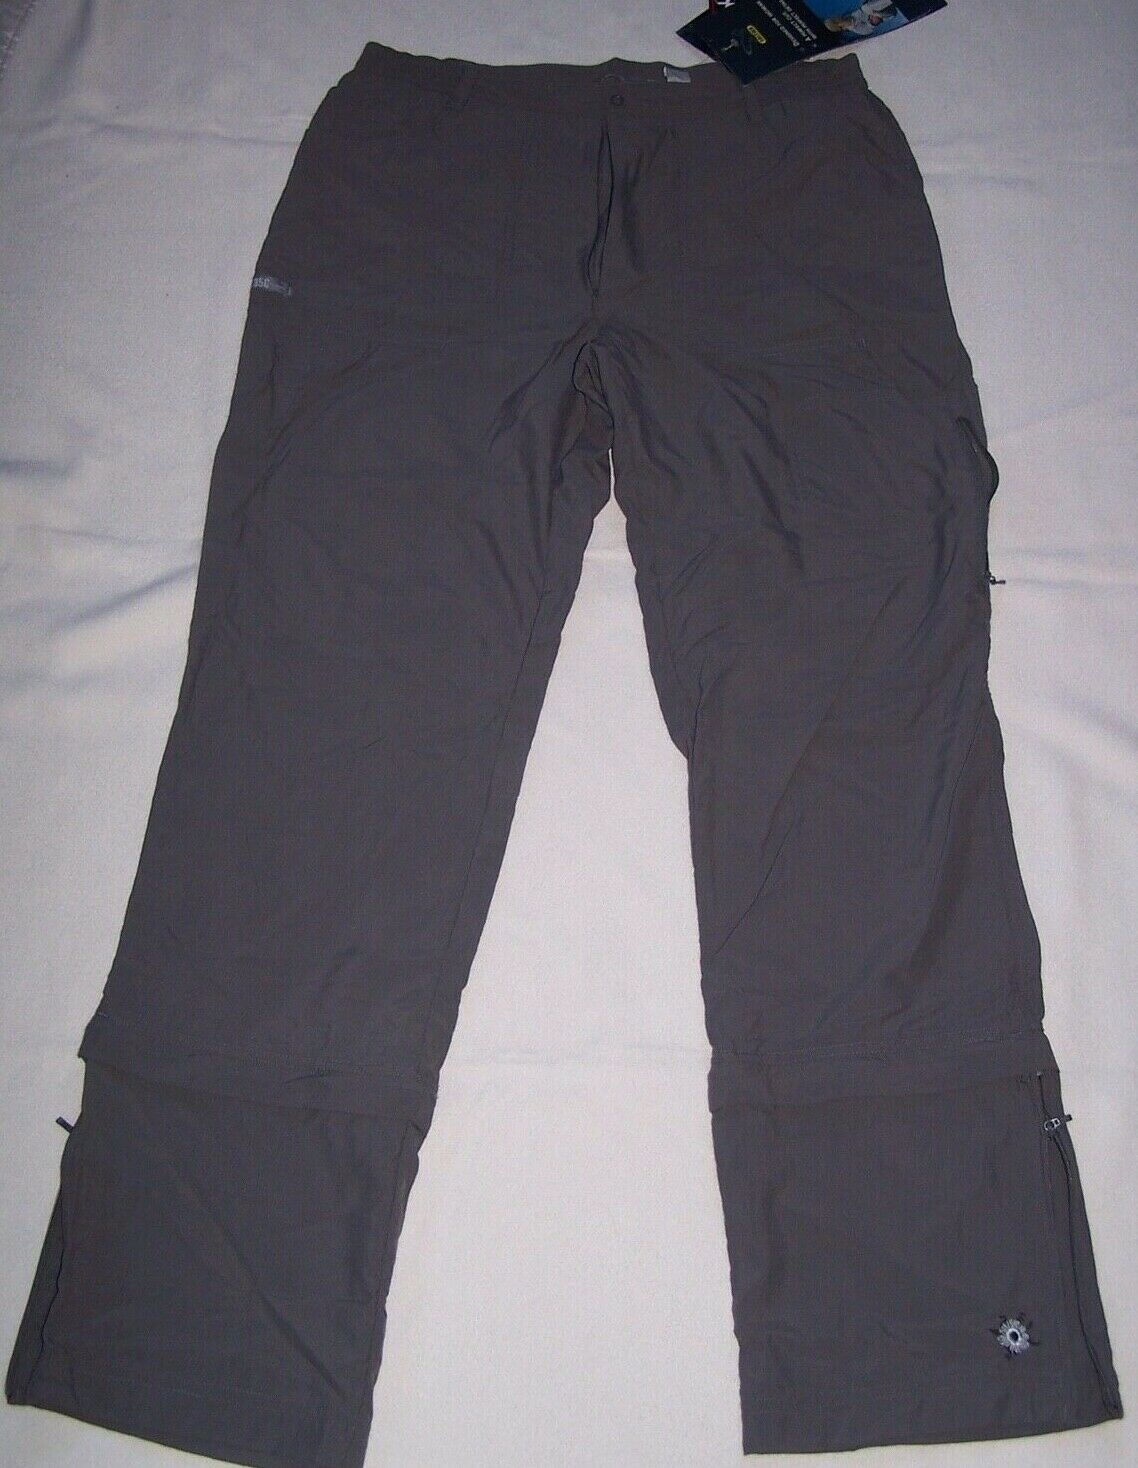 NEU SALEWA Damen Hose Wanderhose Freizeithose grau Gr 40 Polyamid Polyamid Polyamid Extras leicht | Kompletter Spezifikationsbereich  23b94b